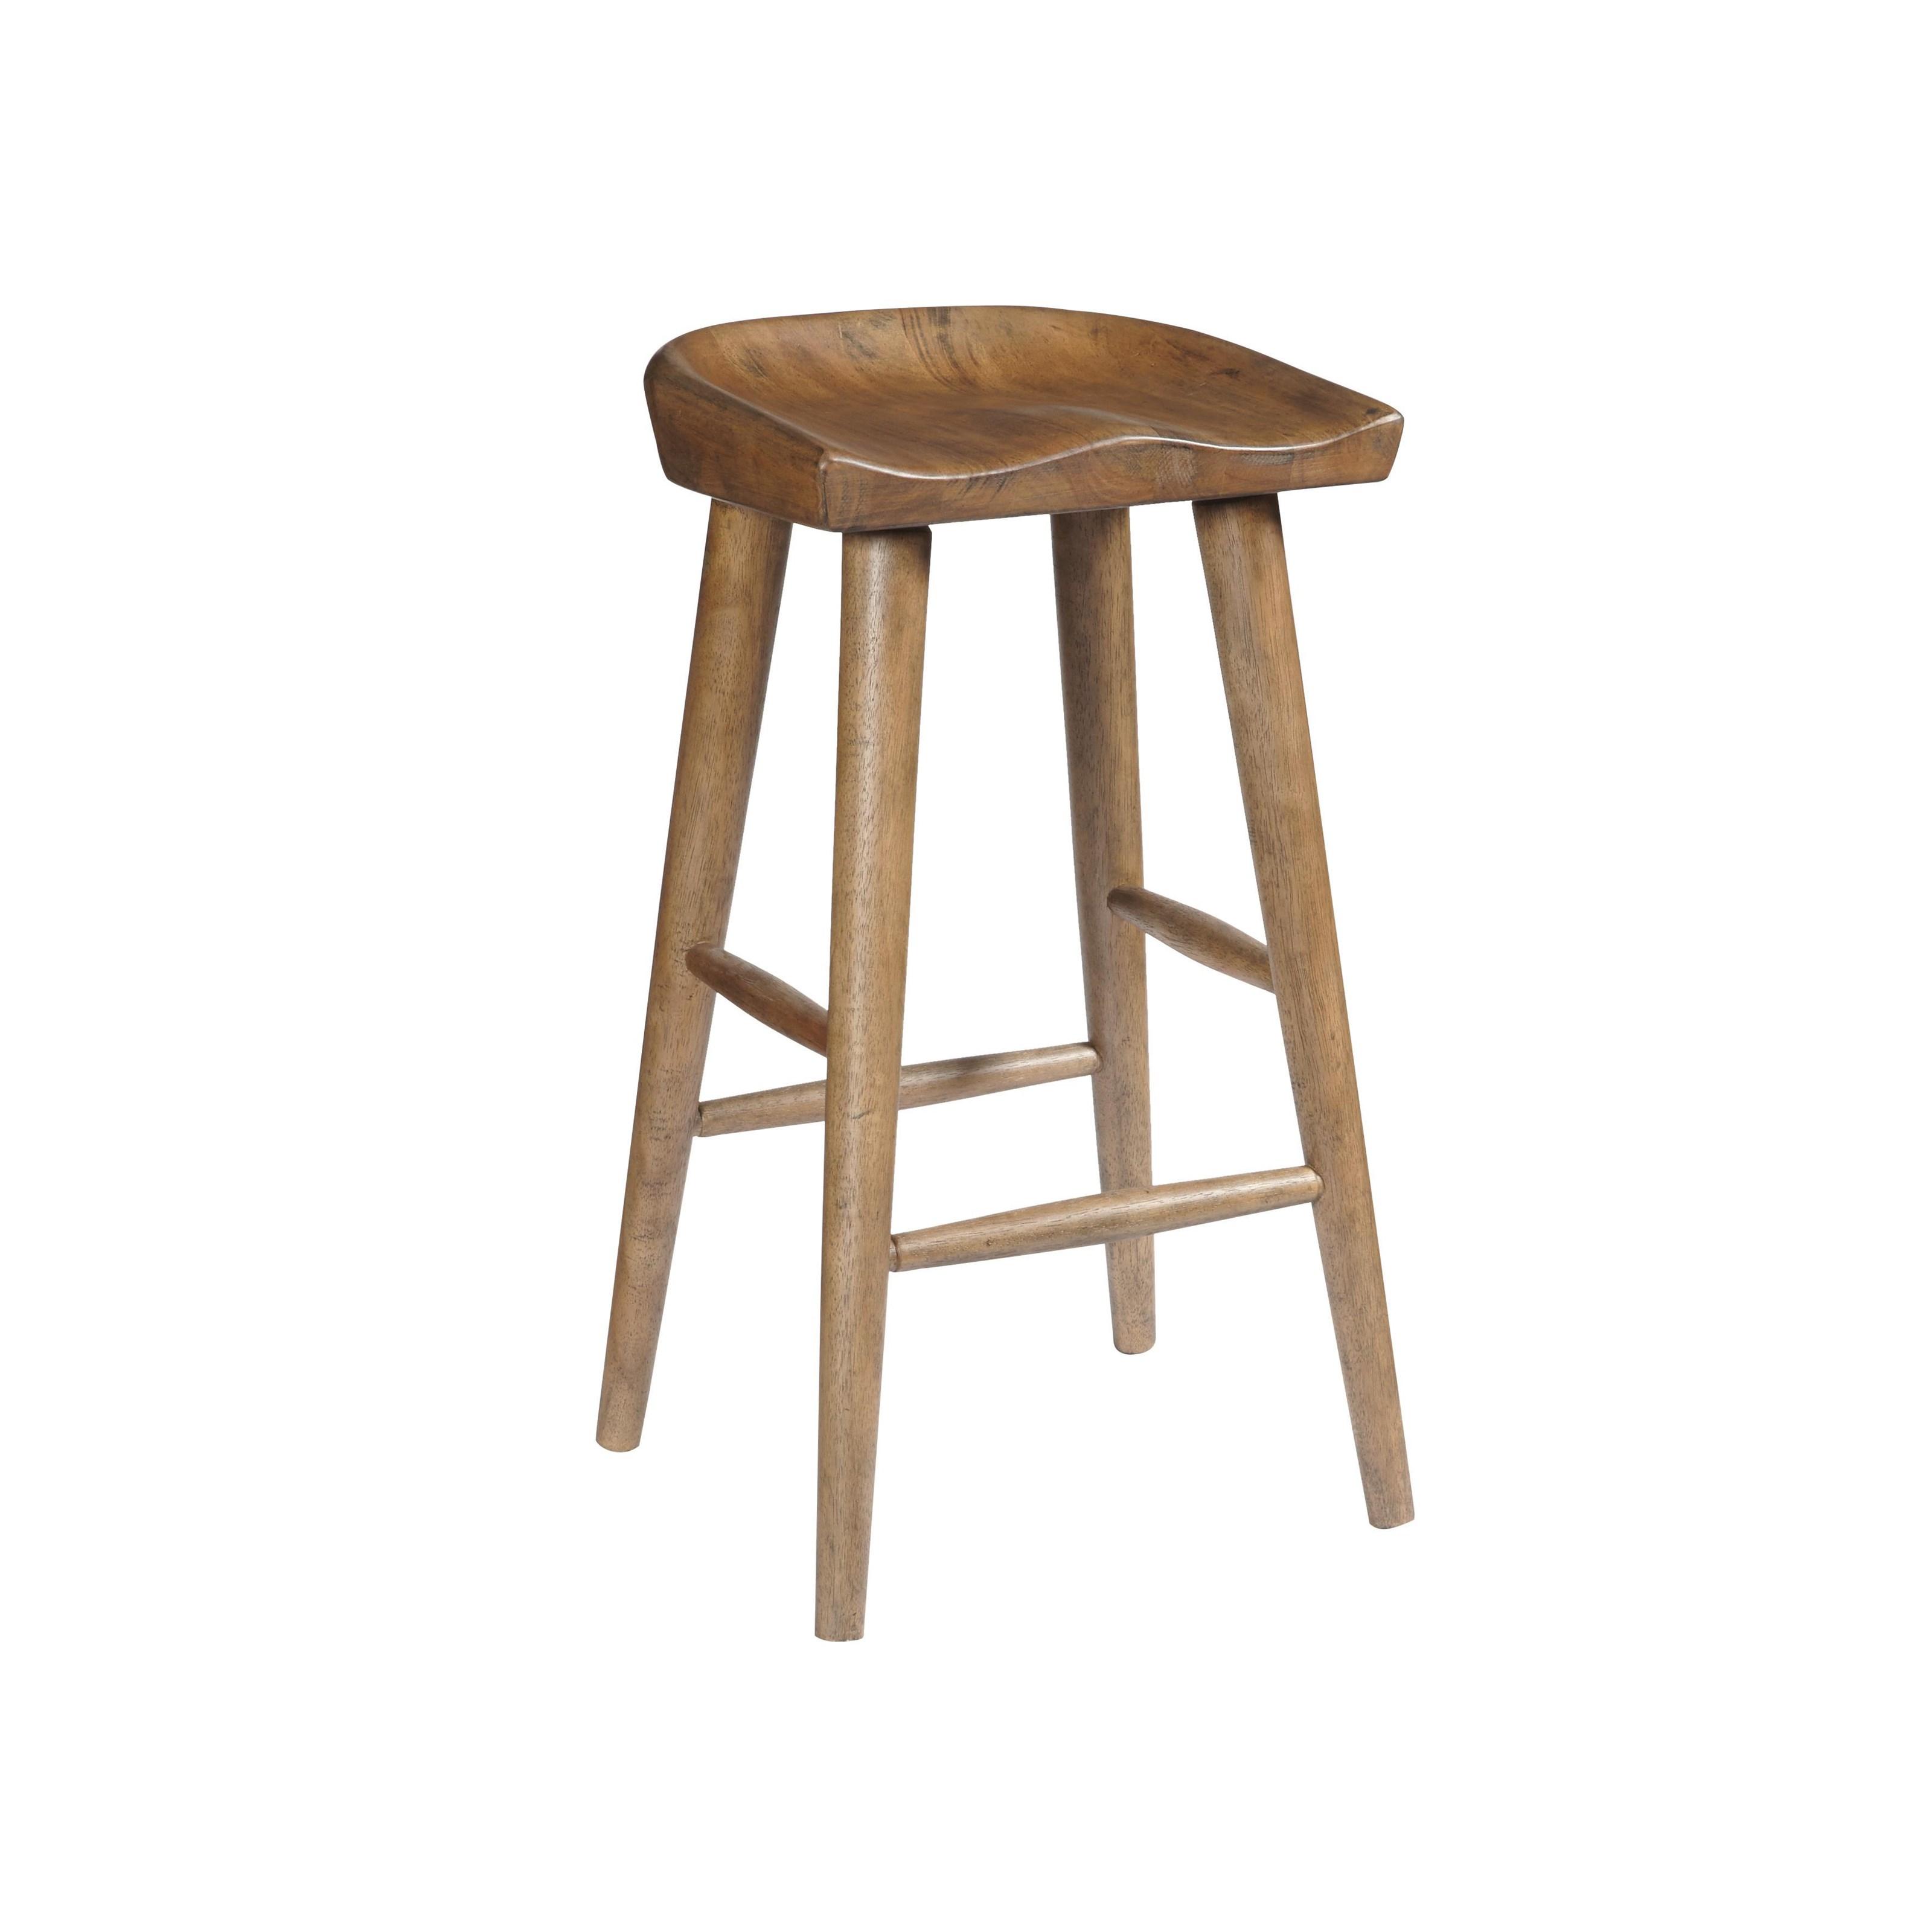 "Frankenberg Saddle 30"" Bar stool"